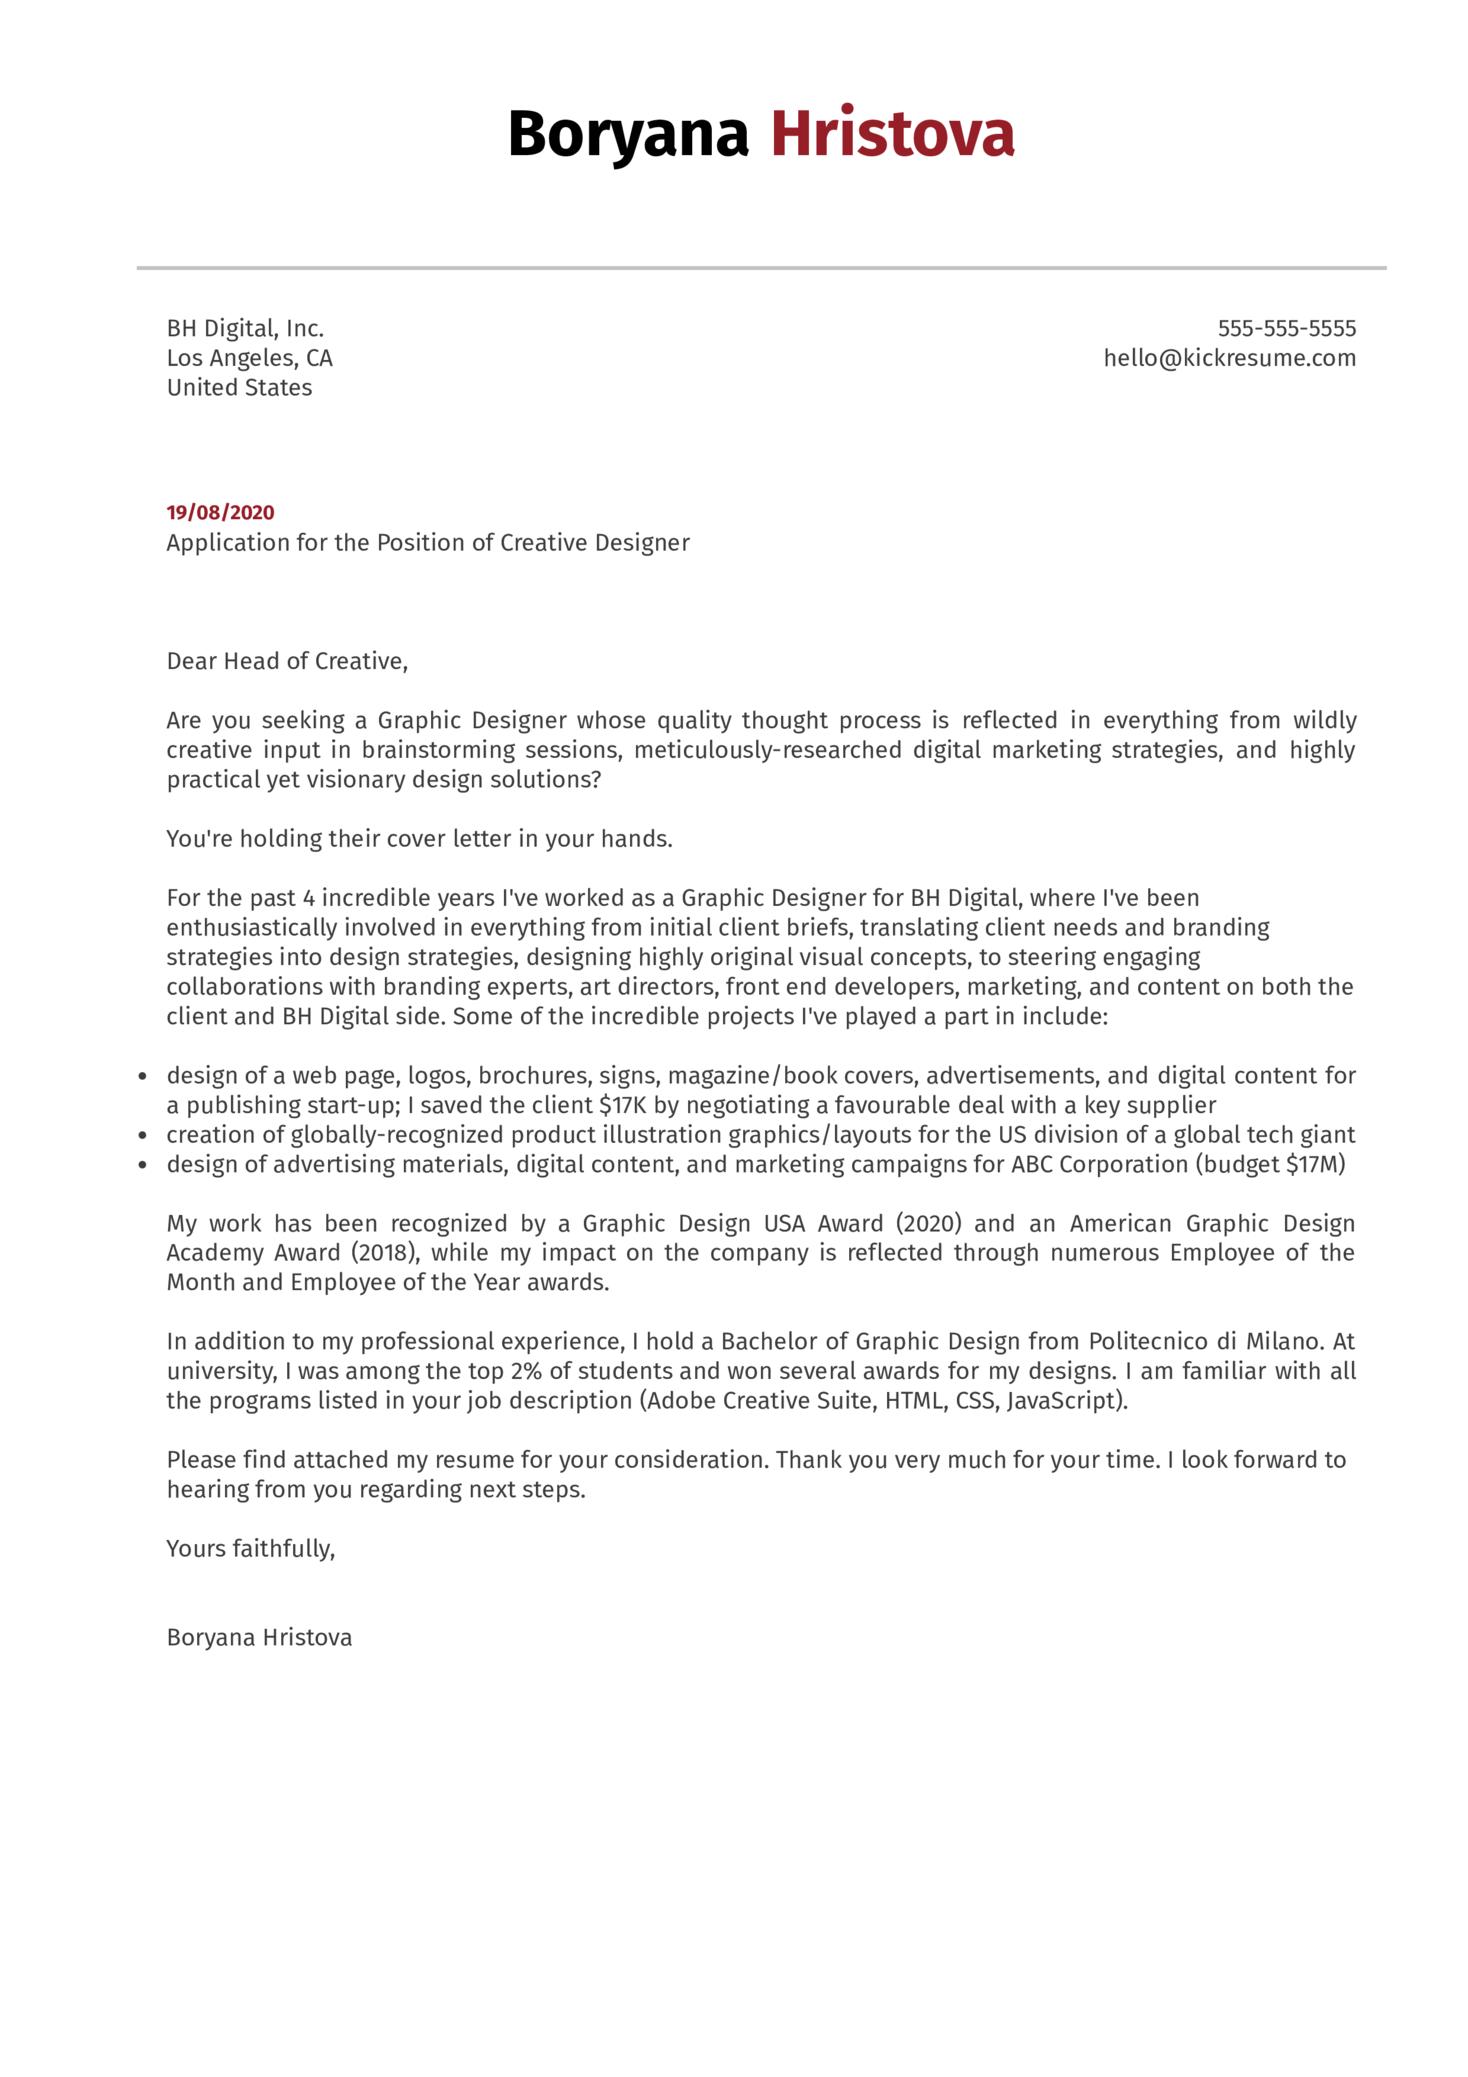 Creative Designer Cover Letter Example